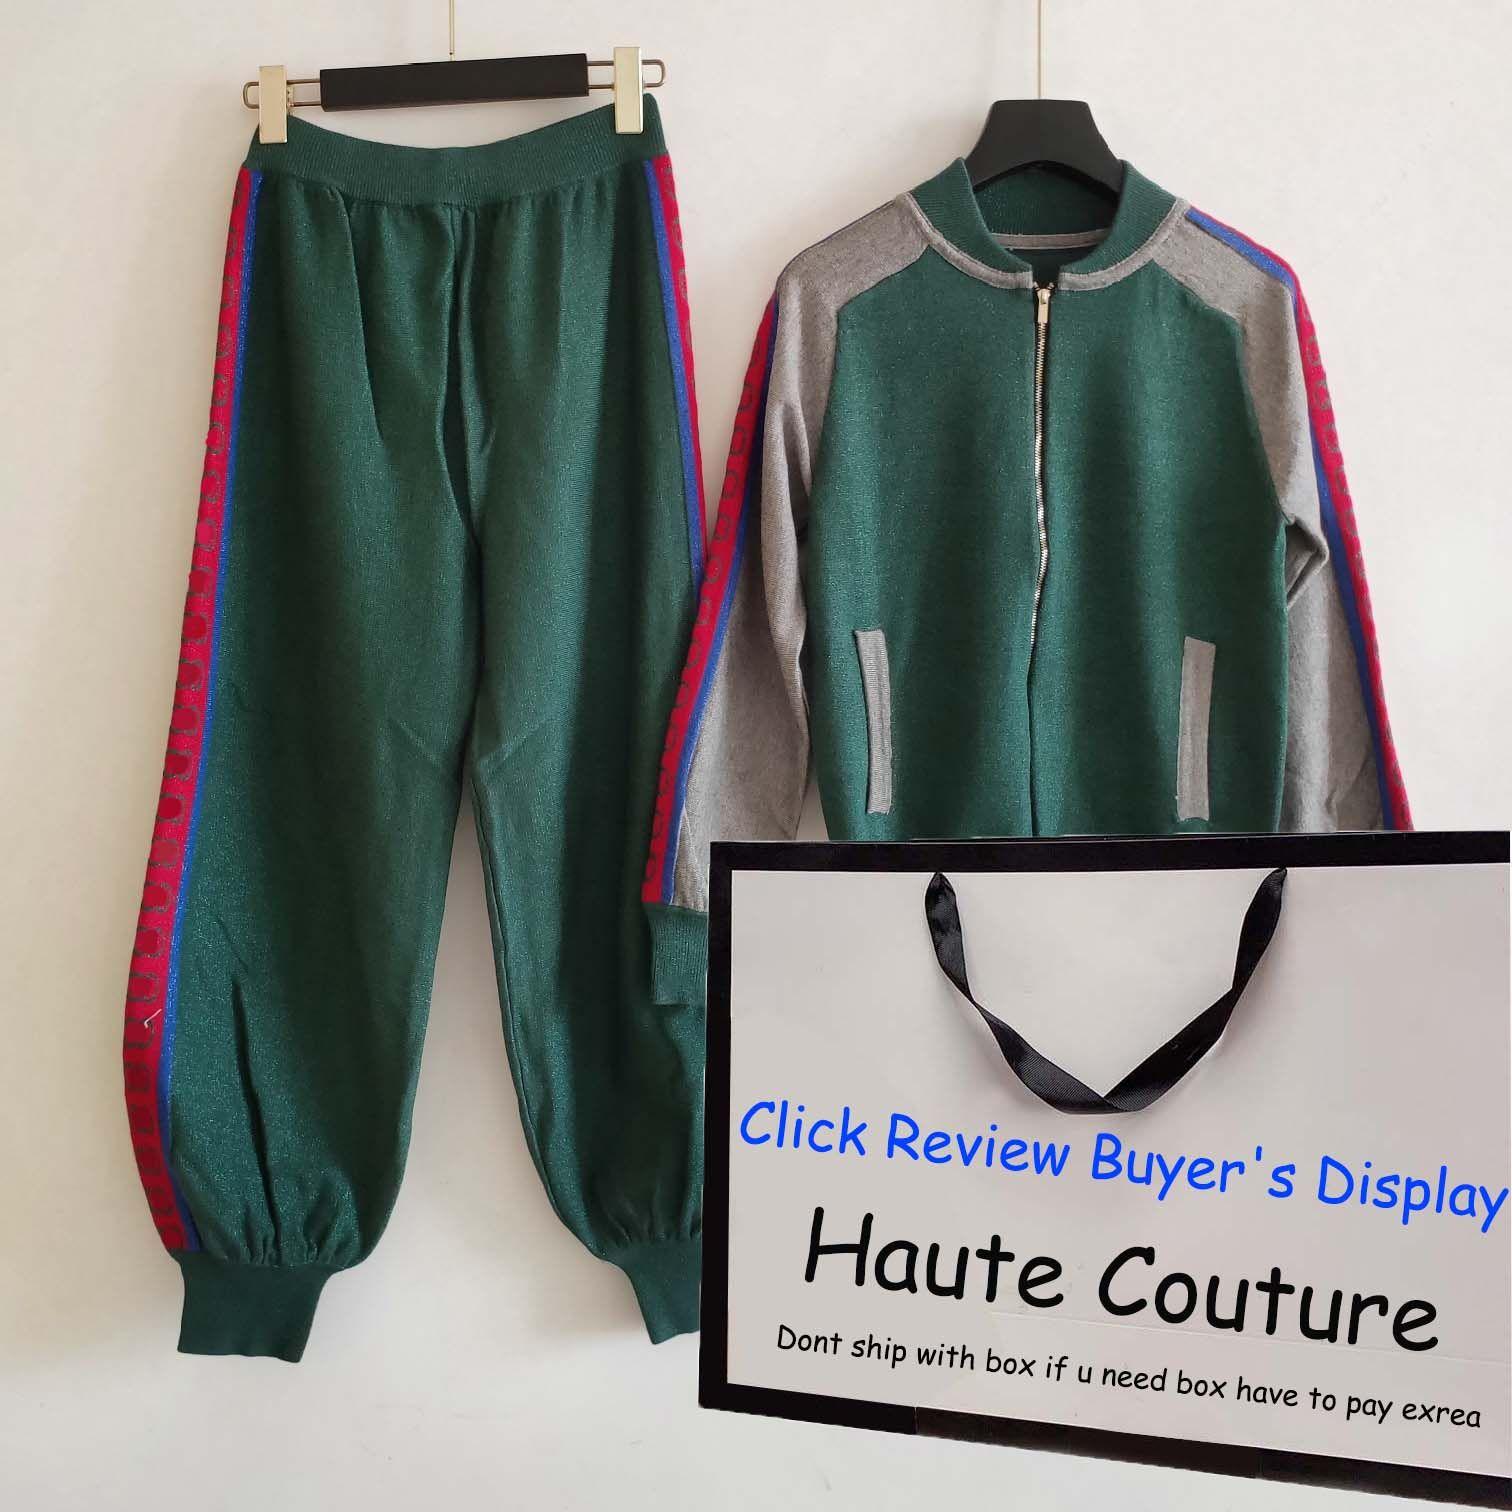 2020 Mens Fashion Tracksuits Grün Blau Herbst neue Ankunfts-Langarm-Zip Neck Men Casual Outfits Jacke + pants Jogger asiatische Größe